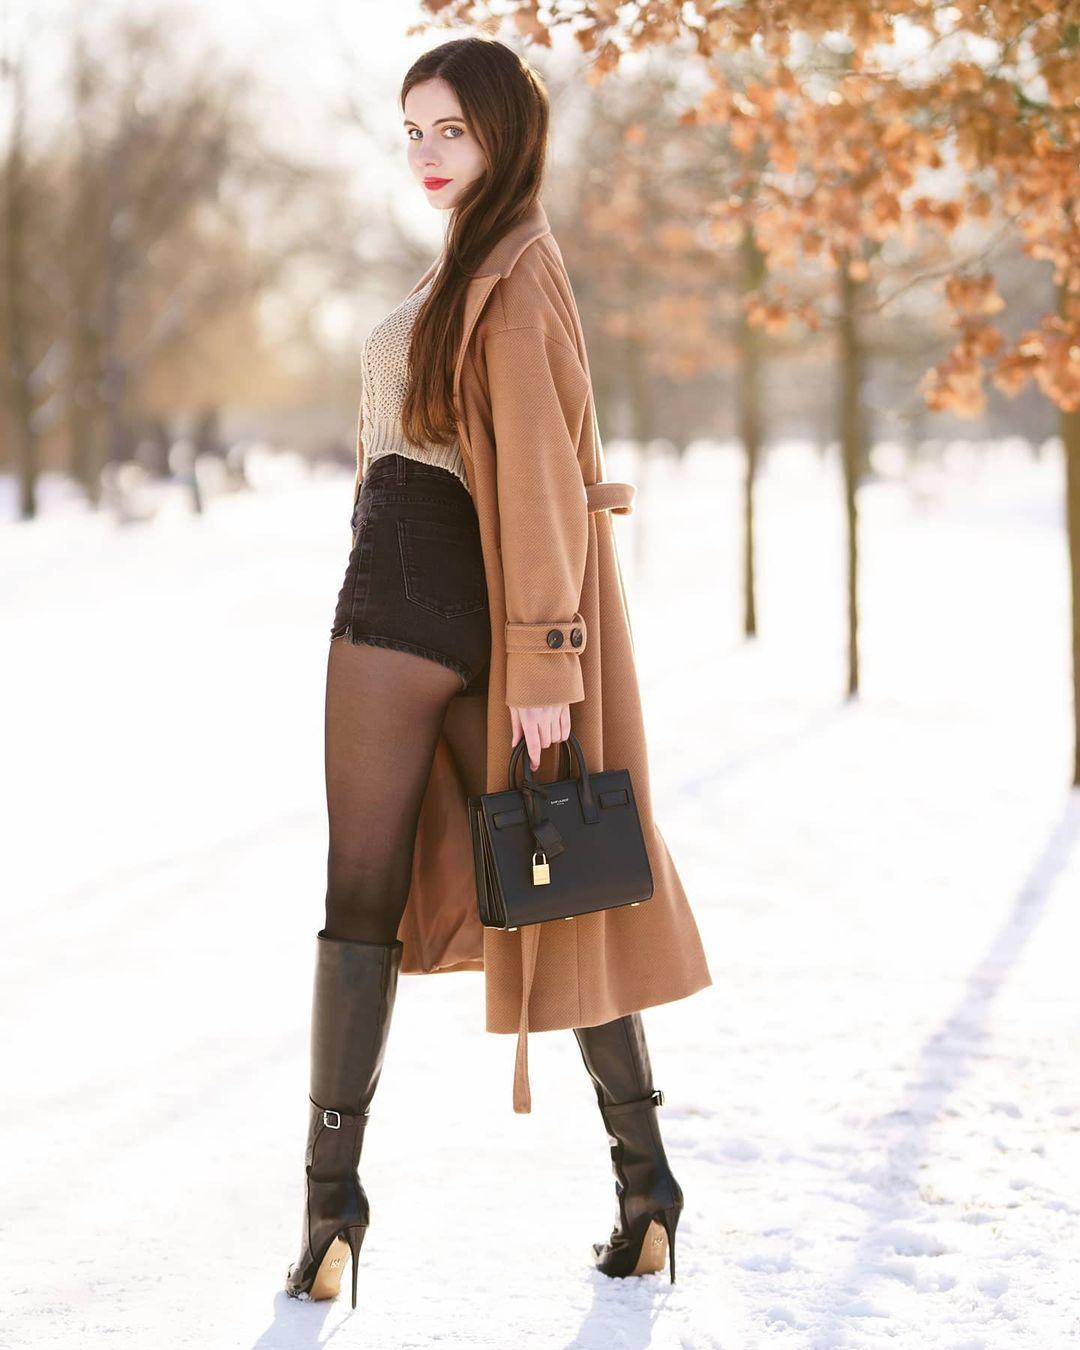 Ariadna - девушка дня из инстаграм (27 Фото) 5